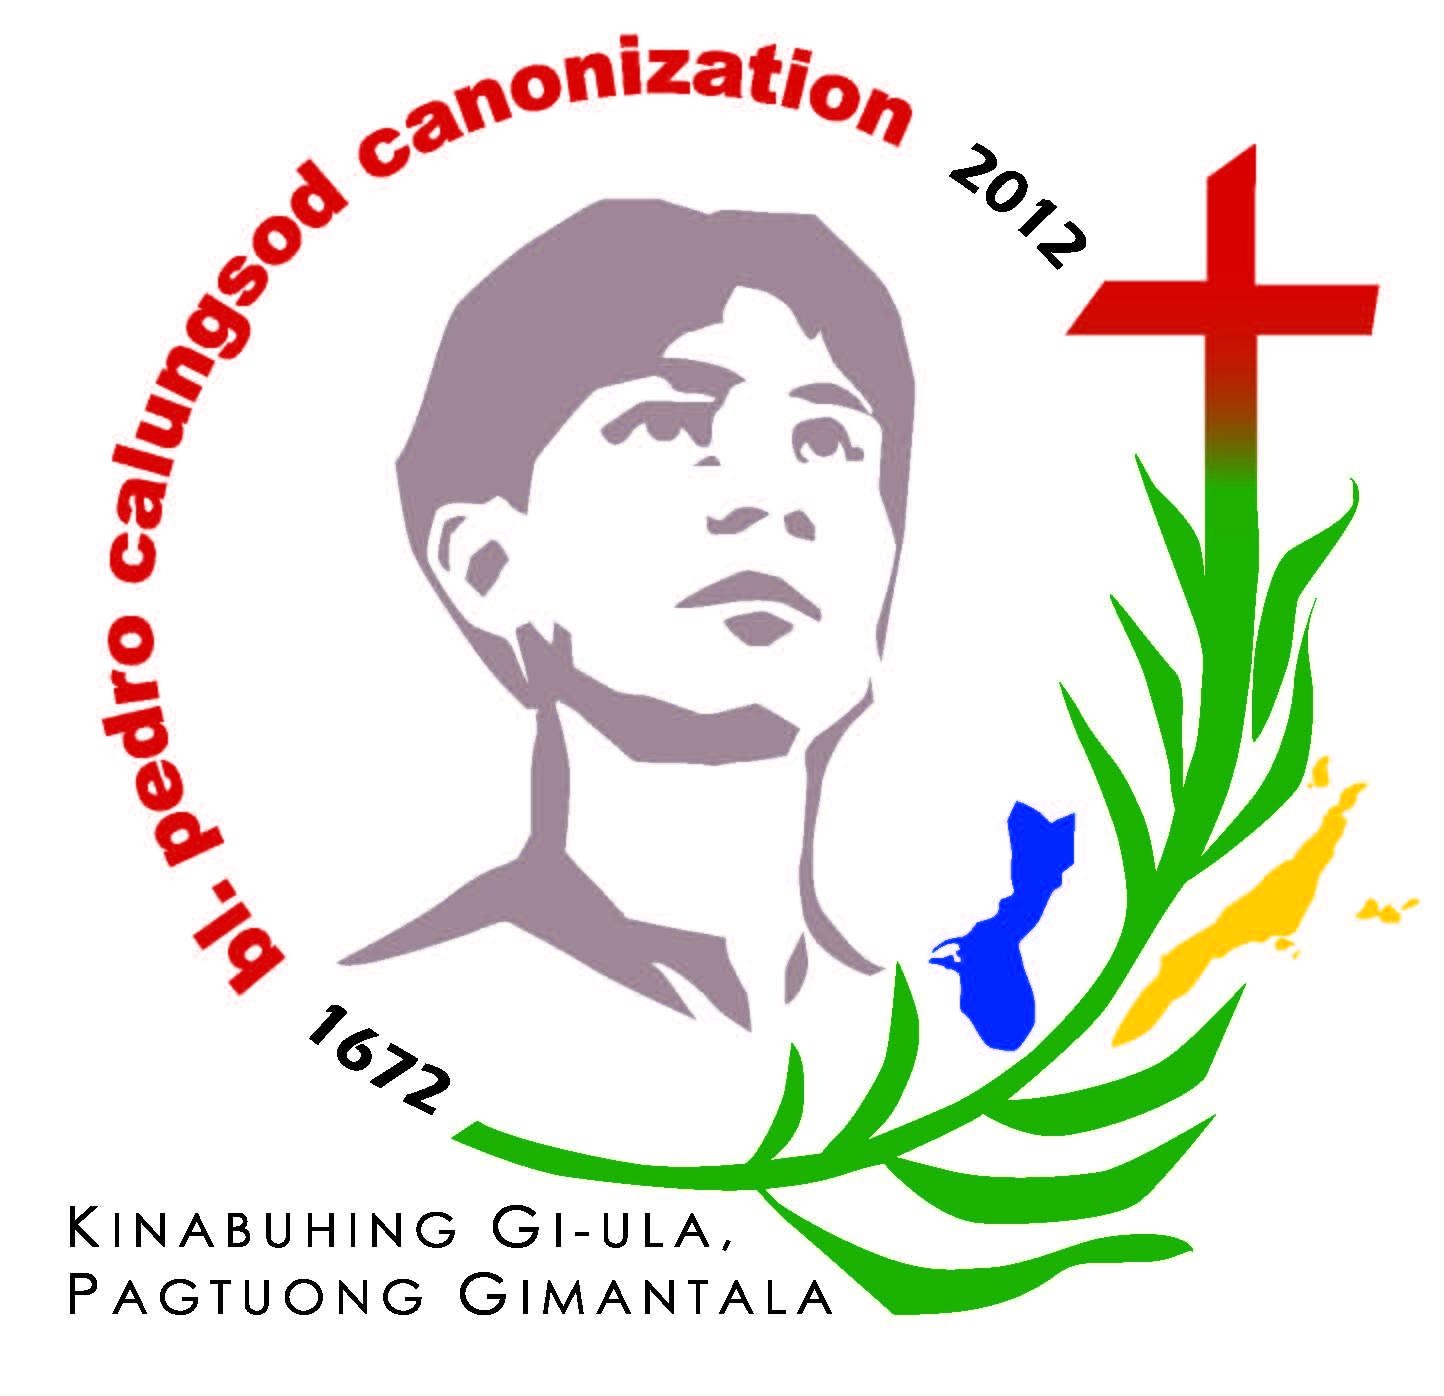 The Filipino Catholic Beato Pedro Calungsod Santo Na